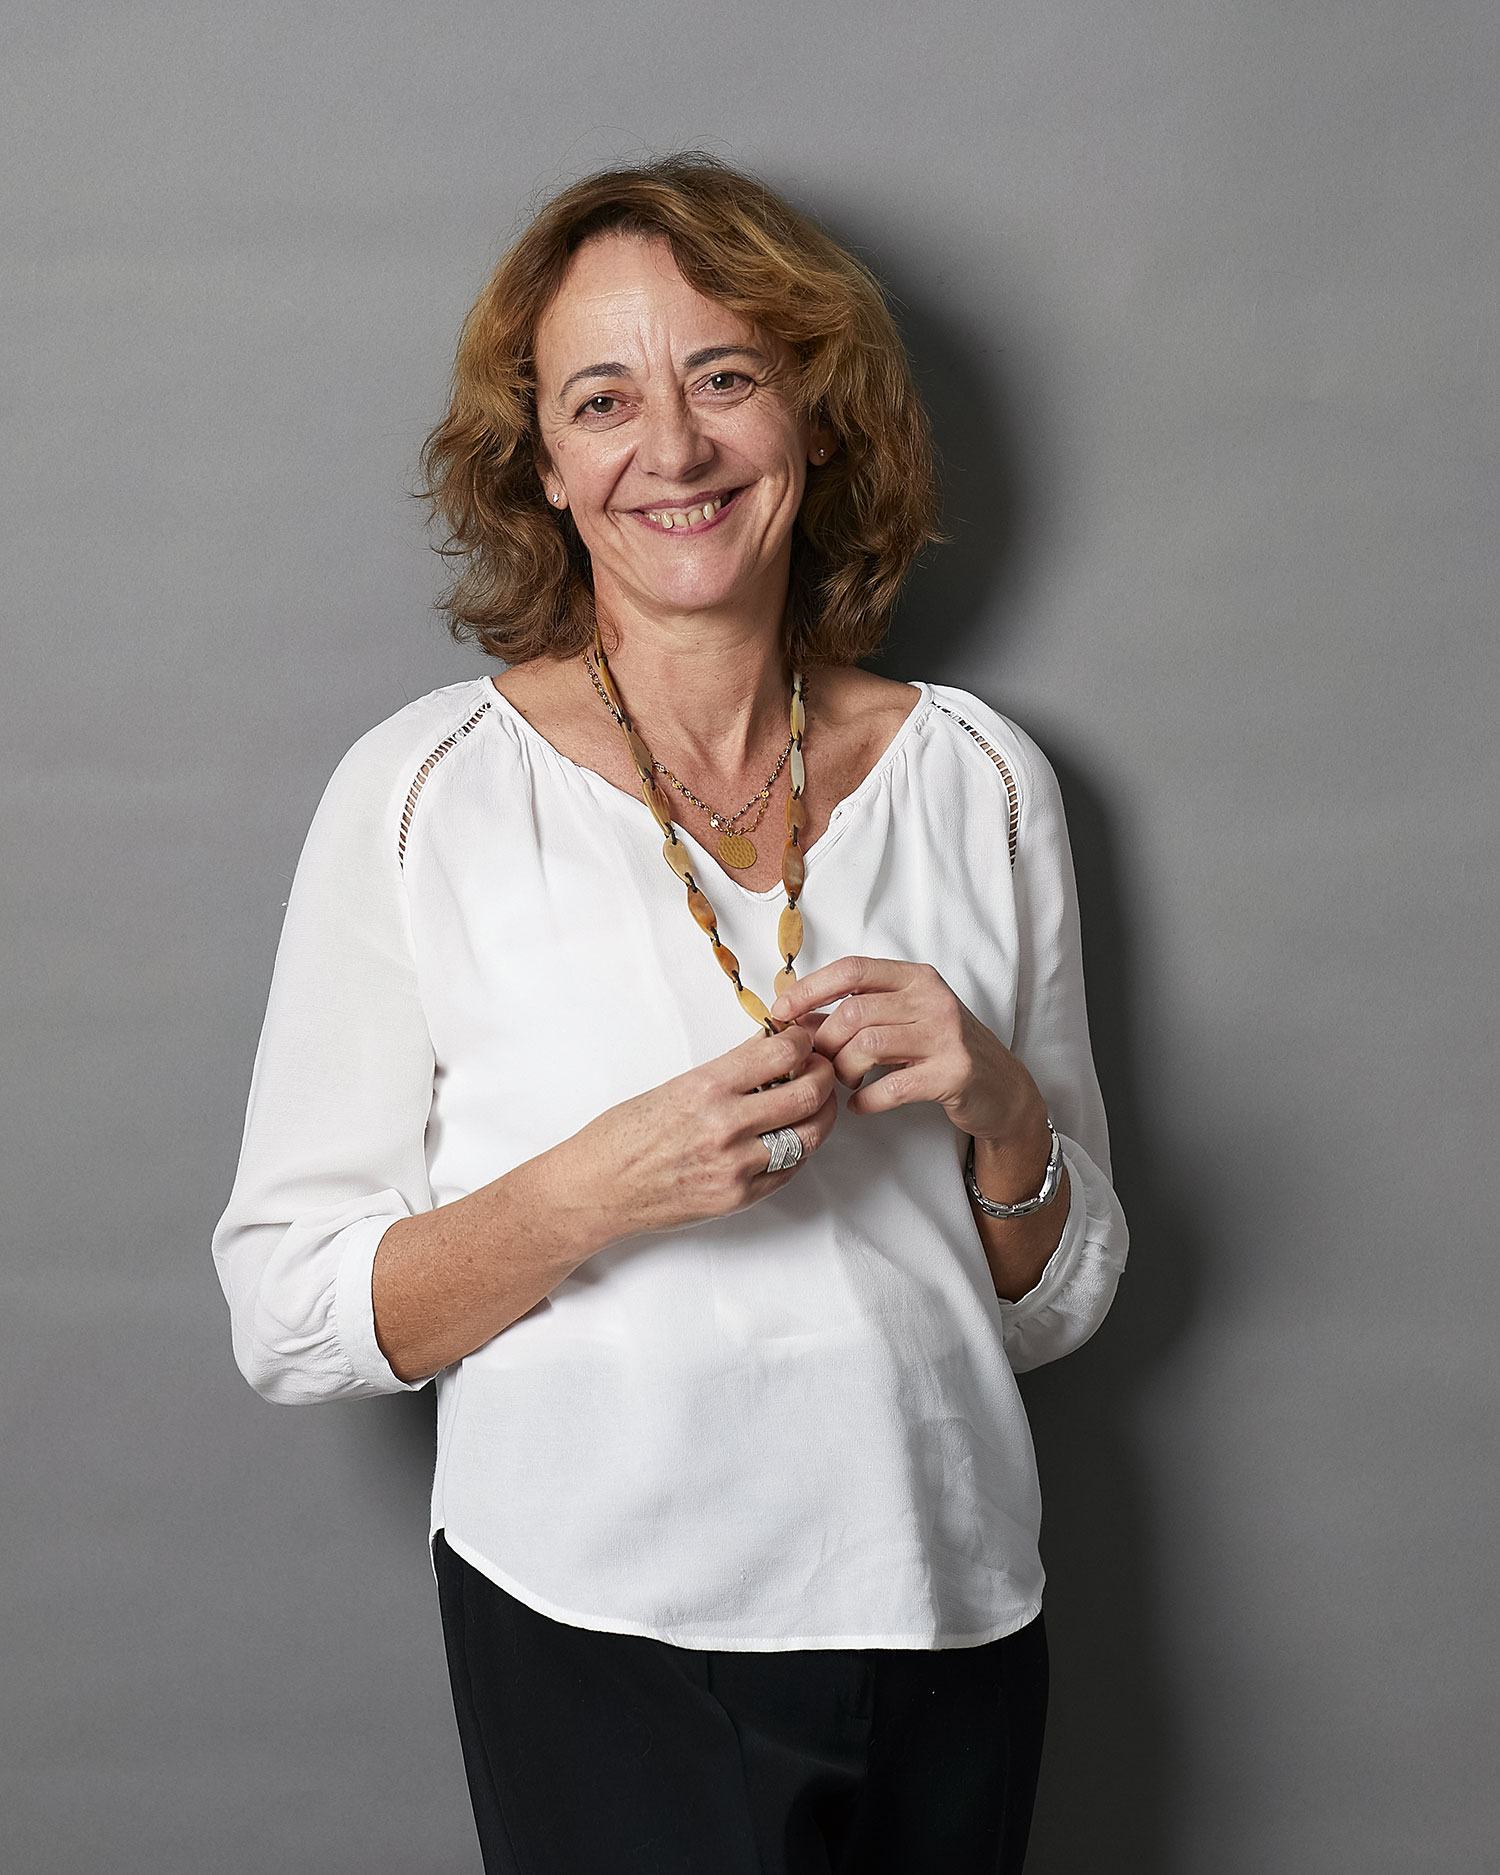 Estelle LEBAS